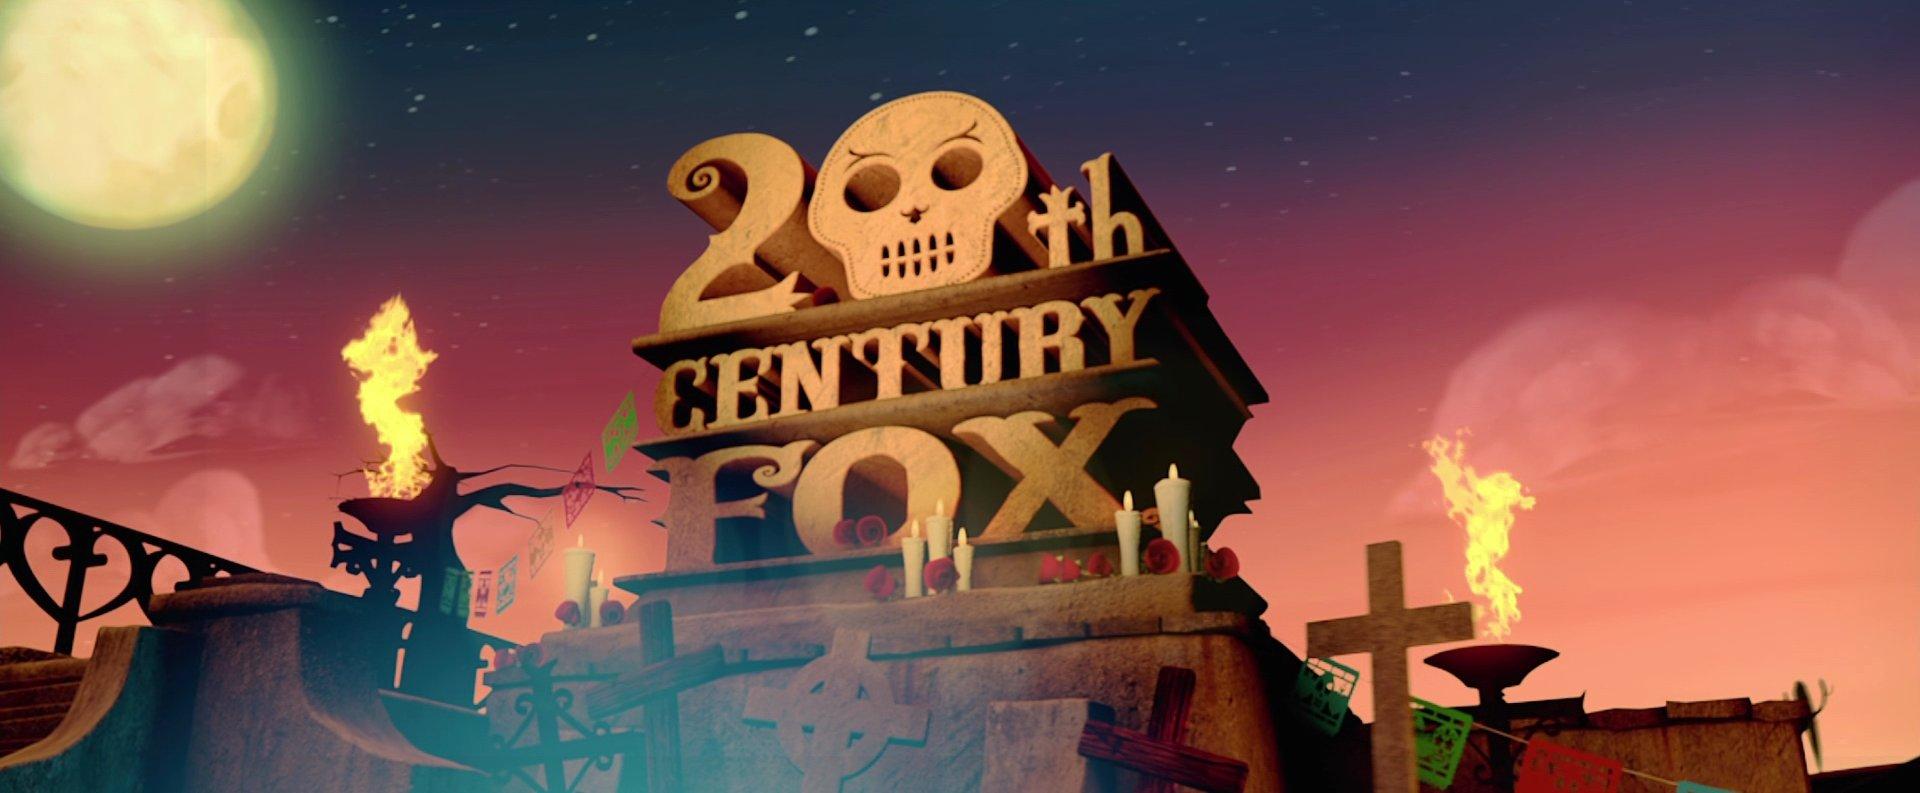 The Book of 20th Century Fox